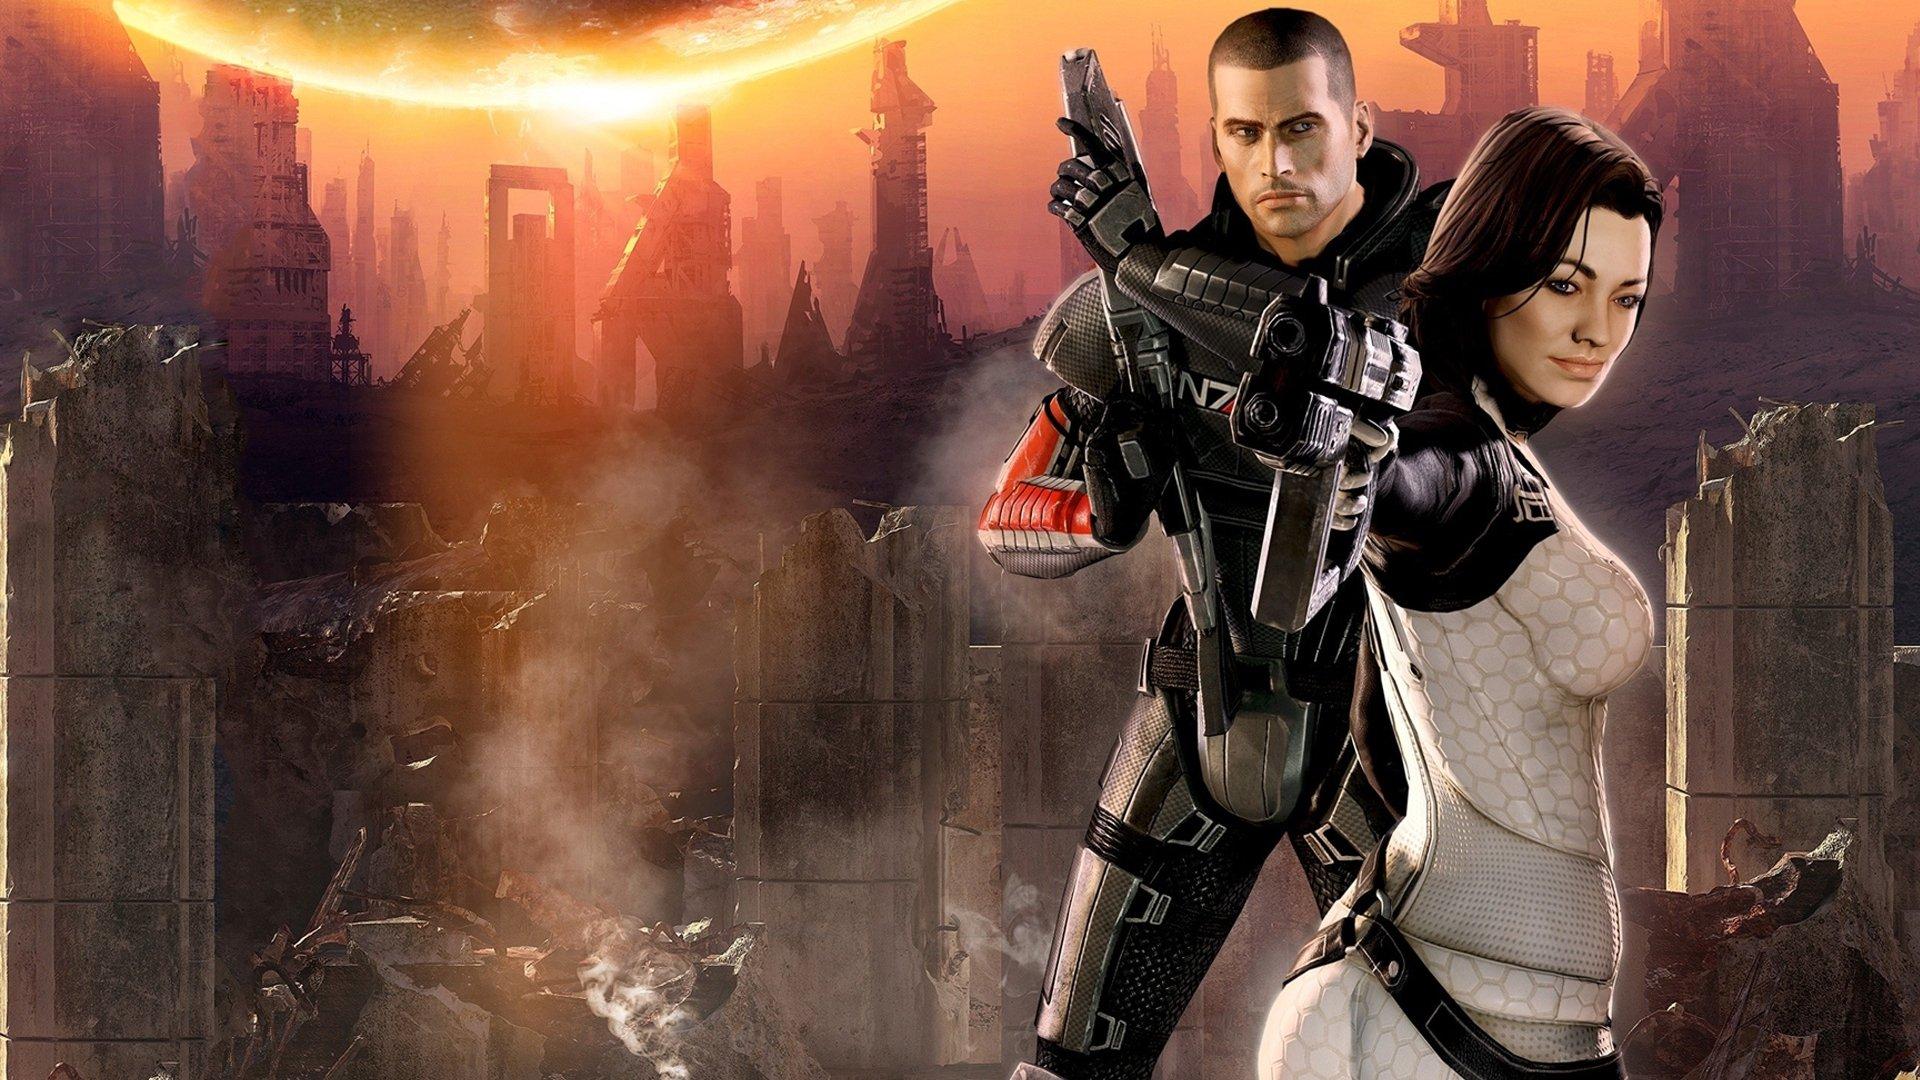 Mass Effect 2 HD Wallpaper | Background Image | 1920x1080 ...